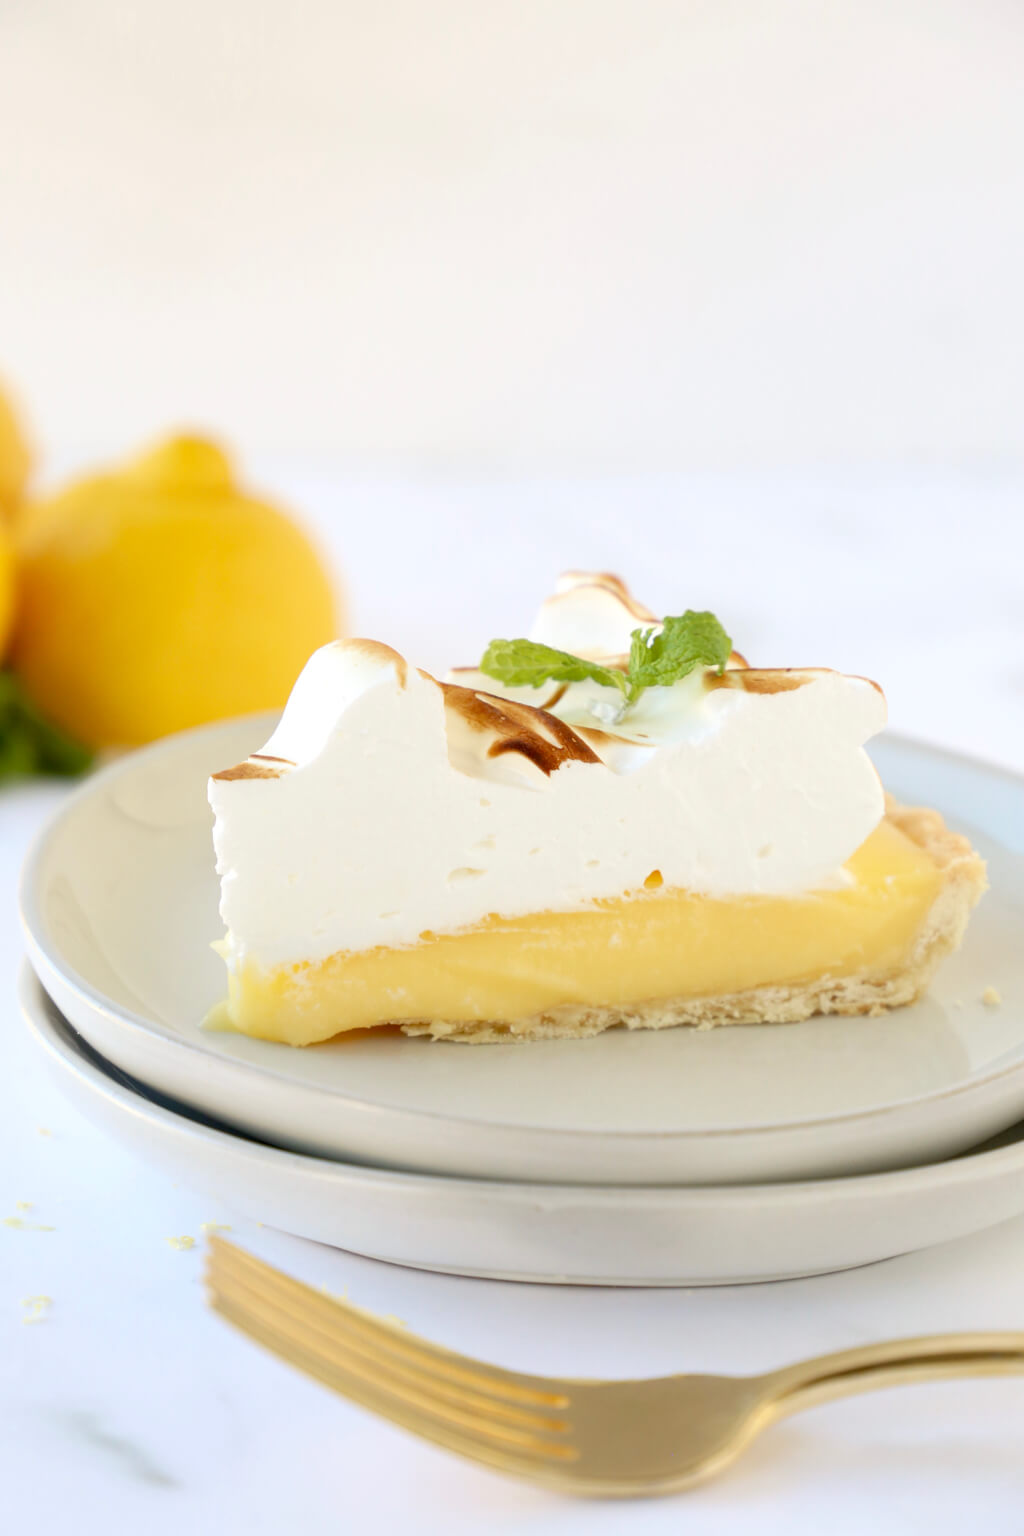 a close up of a slice of lemon meringue tart